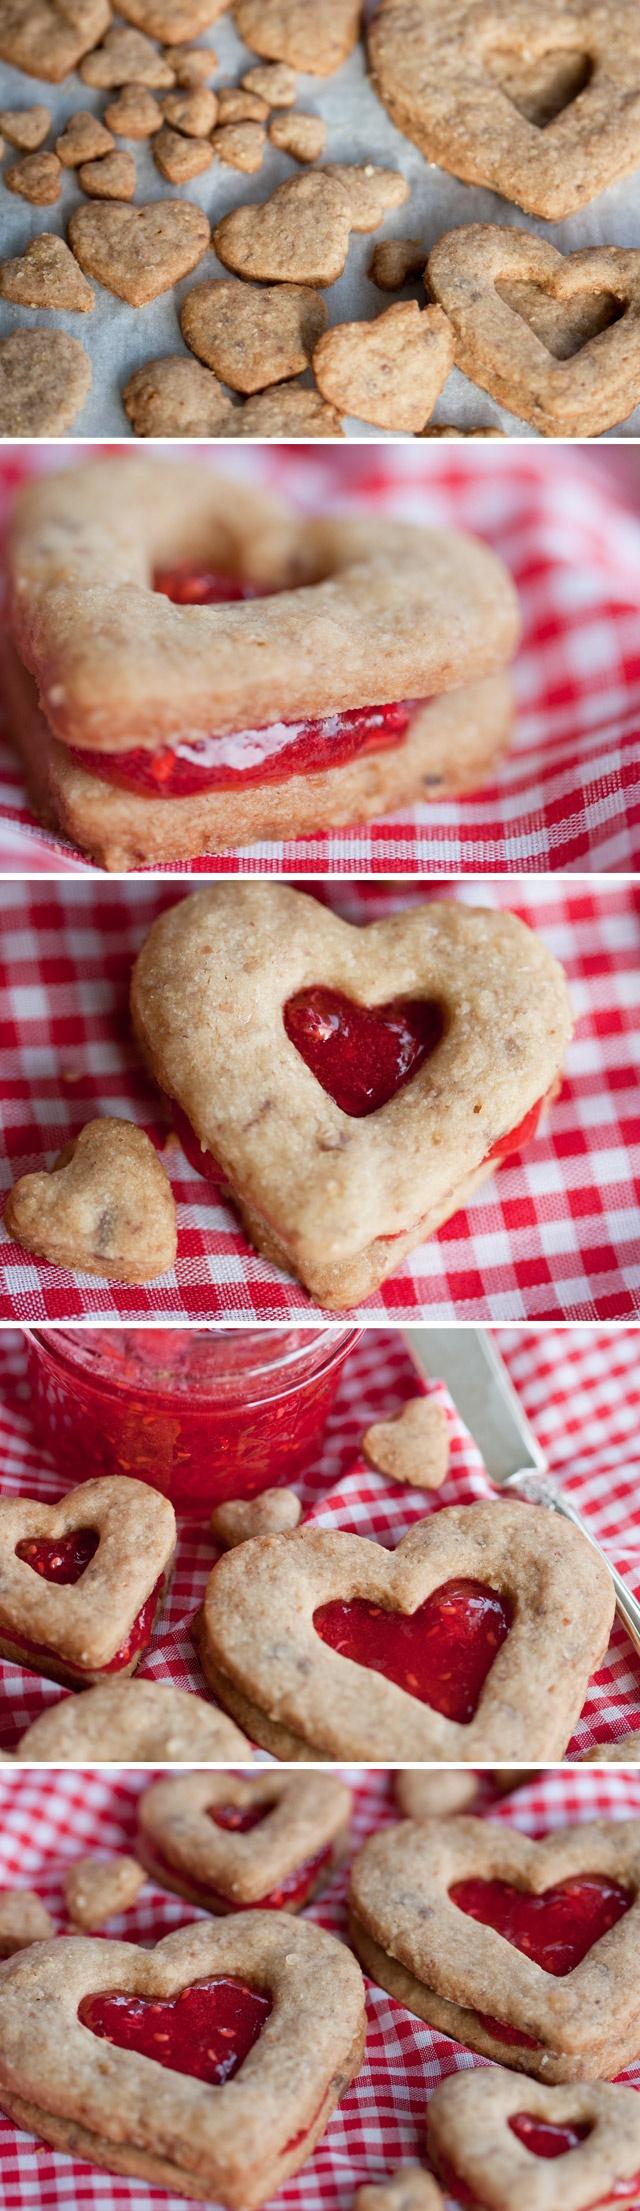 Linzer cookies | dessert 4u | Pinterest